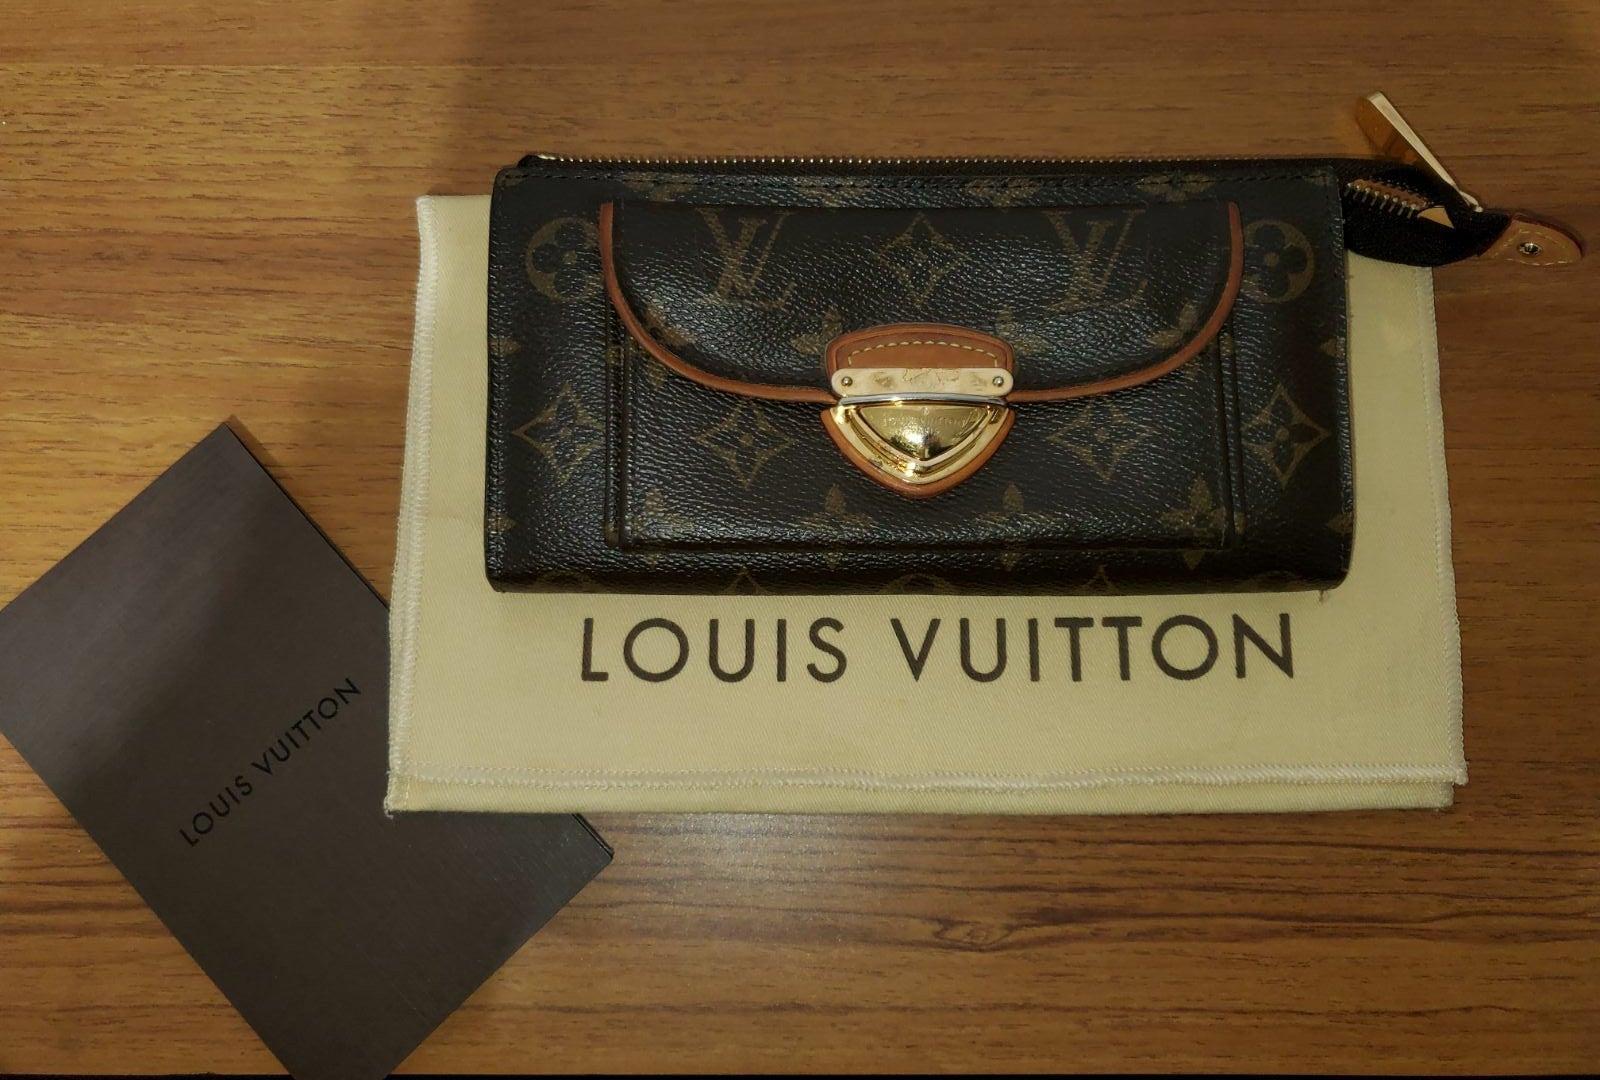 Louis Vuitton Portefeuille Astrid wallet